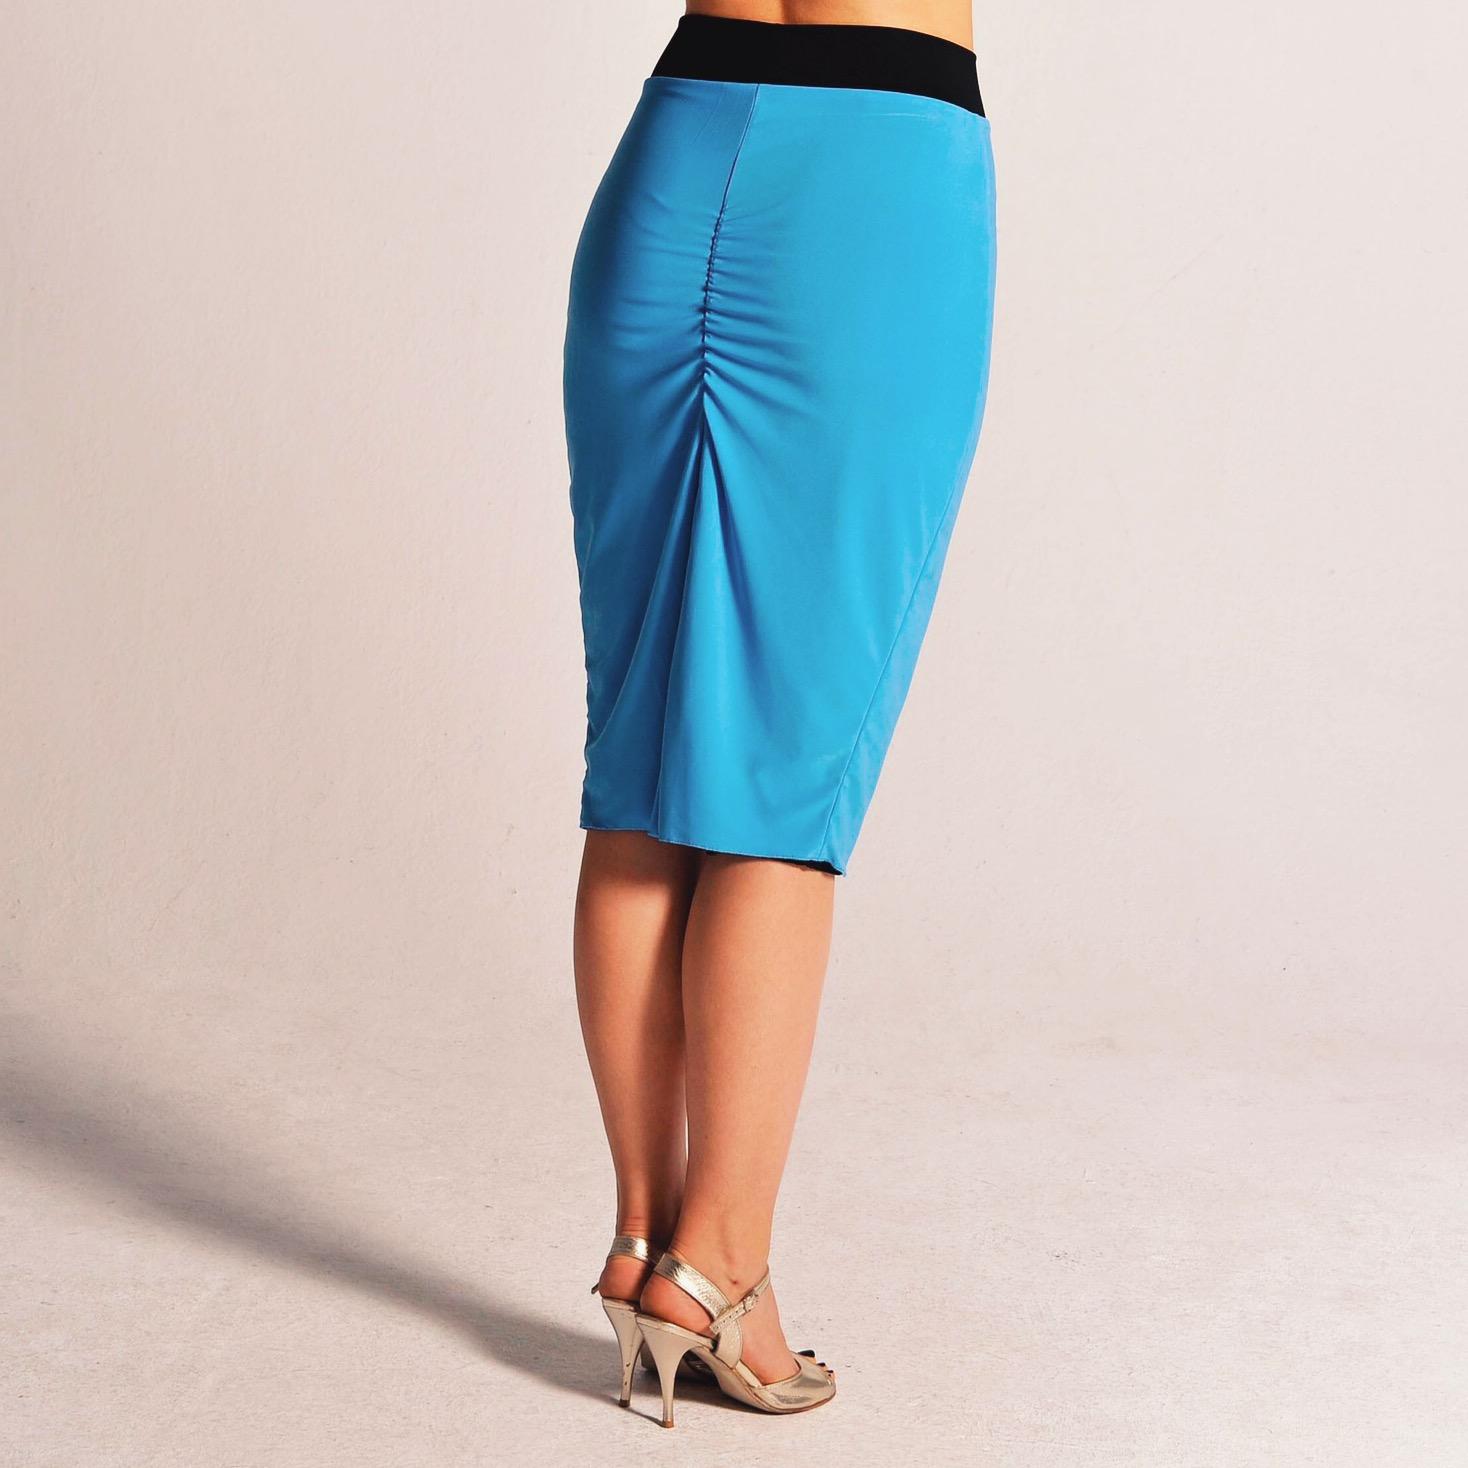 CLARA_sky_blue_tango_skirt.JPG